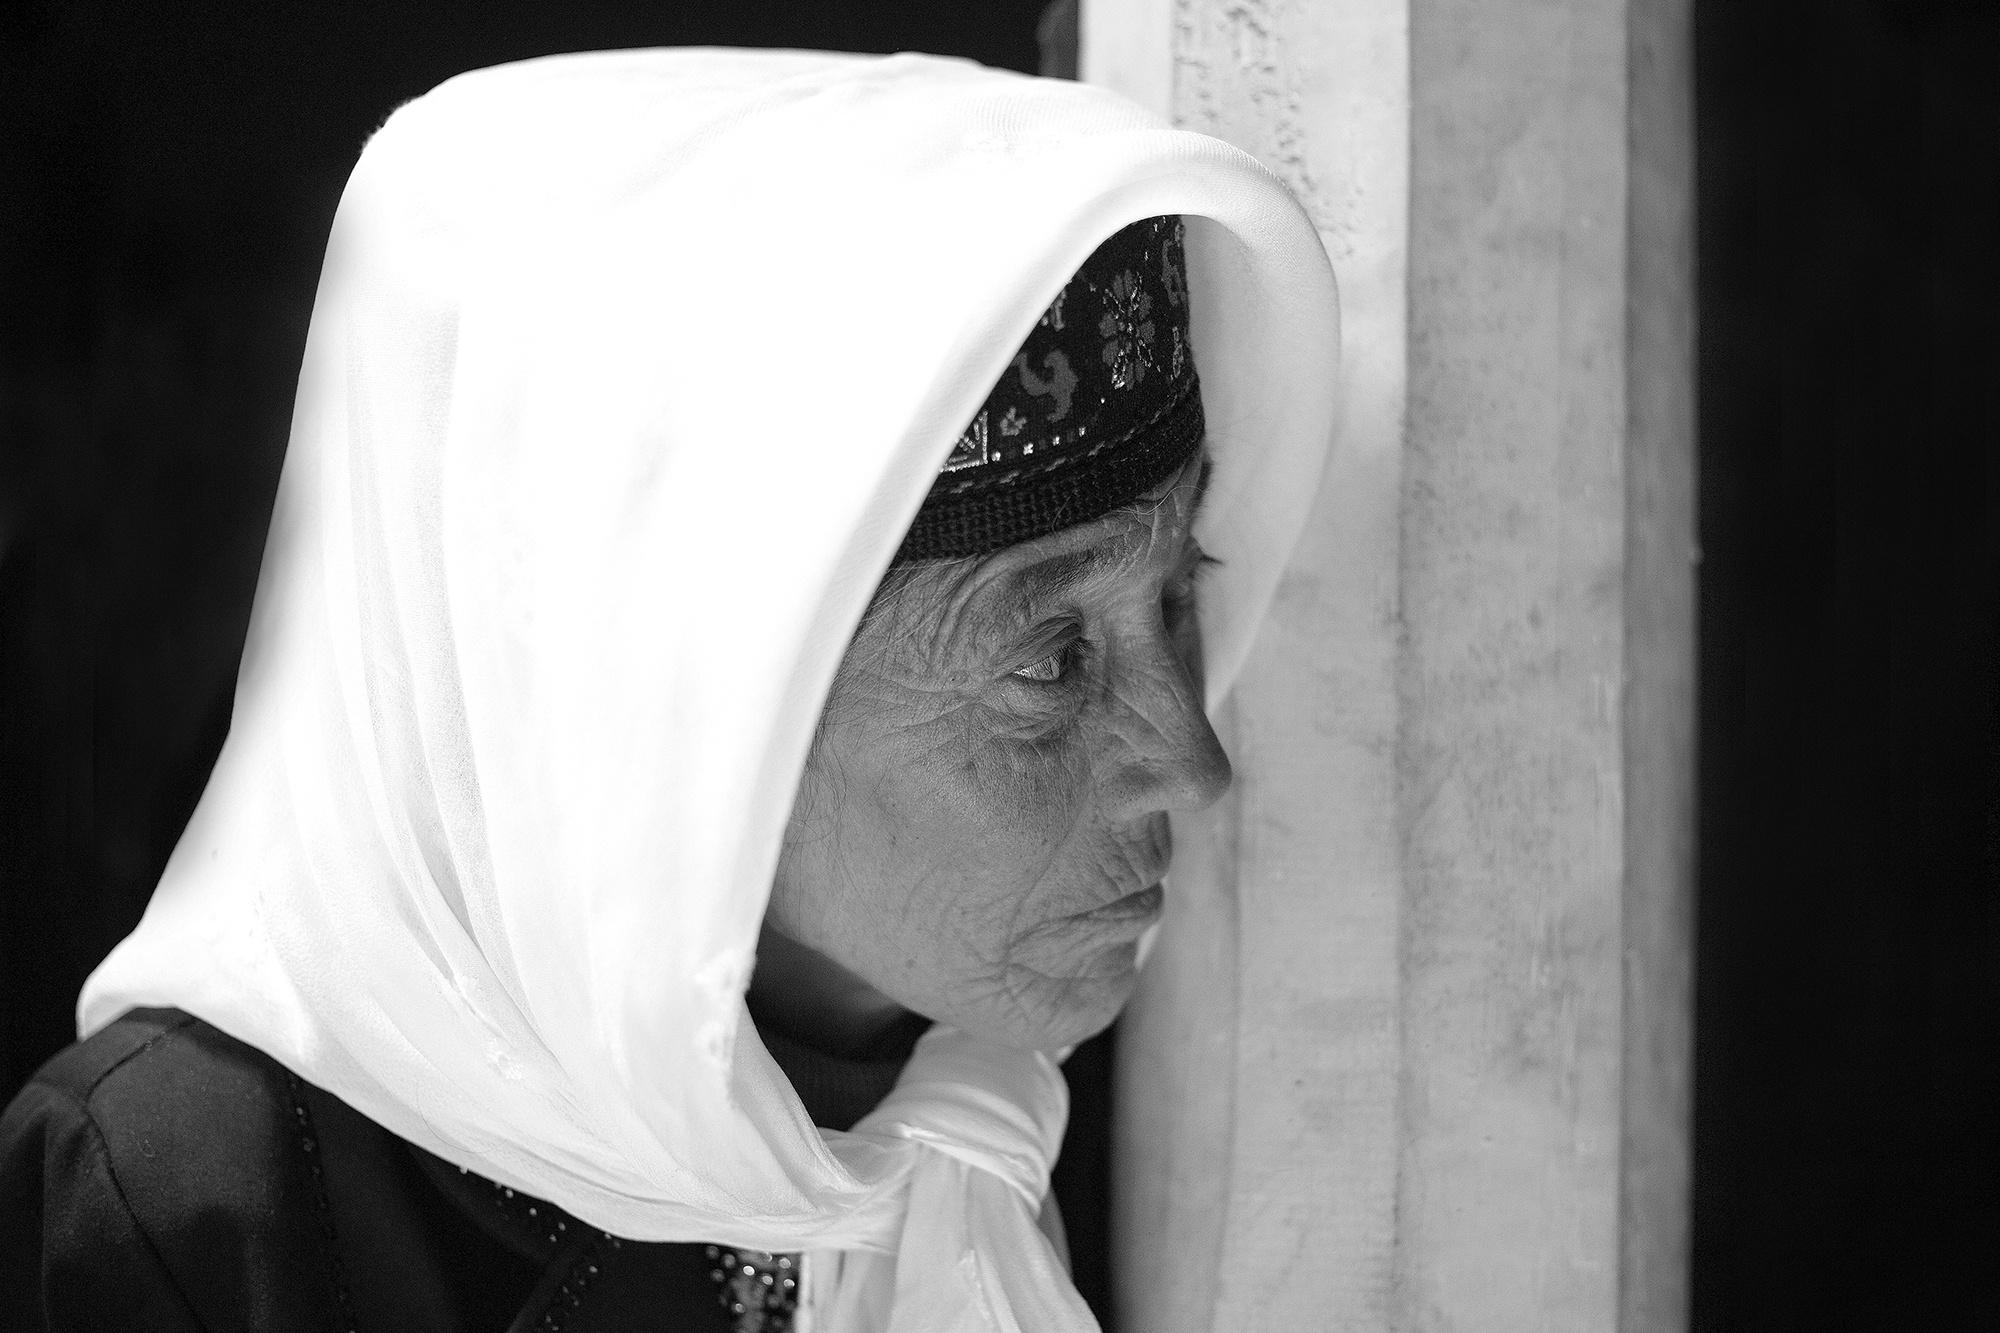 Xinjiang Région ouïghoure Maxime Crozet Identité Chine Tadjikes Femmes Pamir Tashkurgan